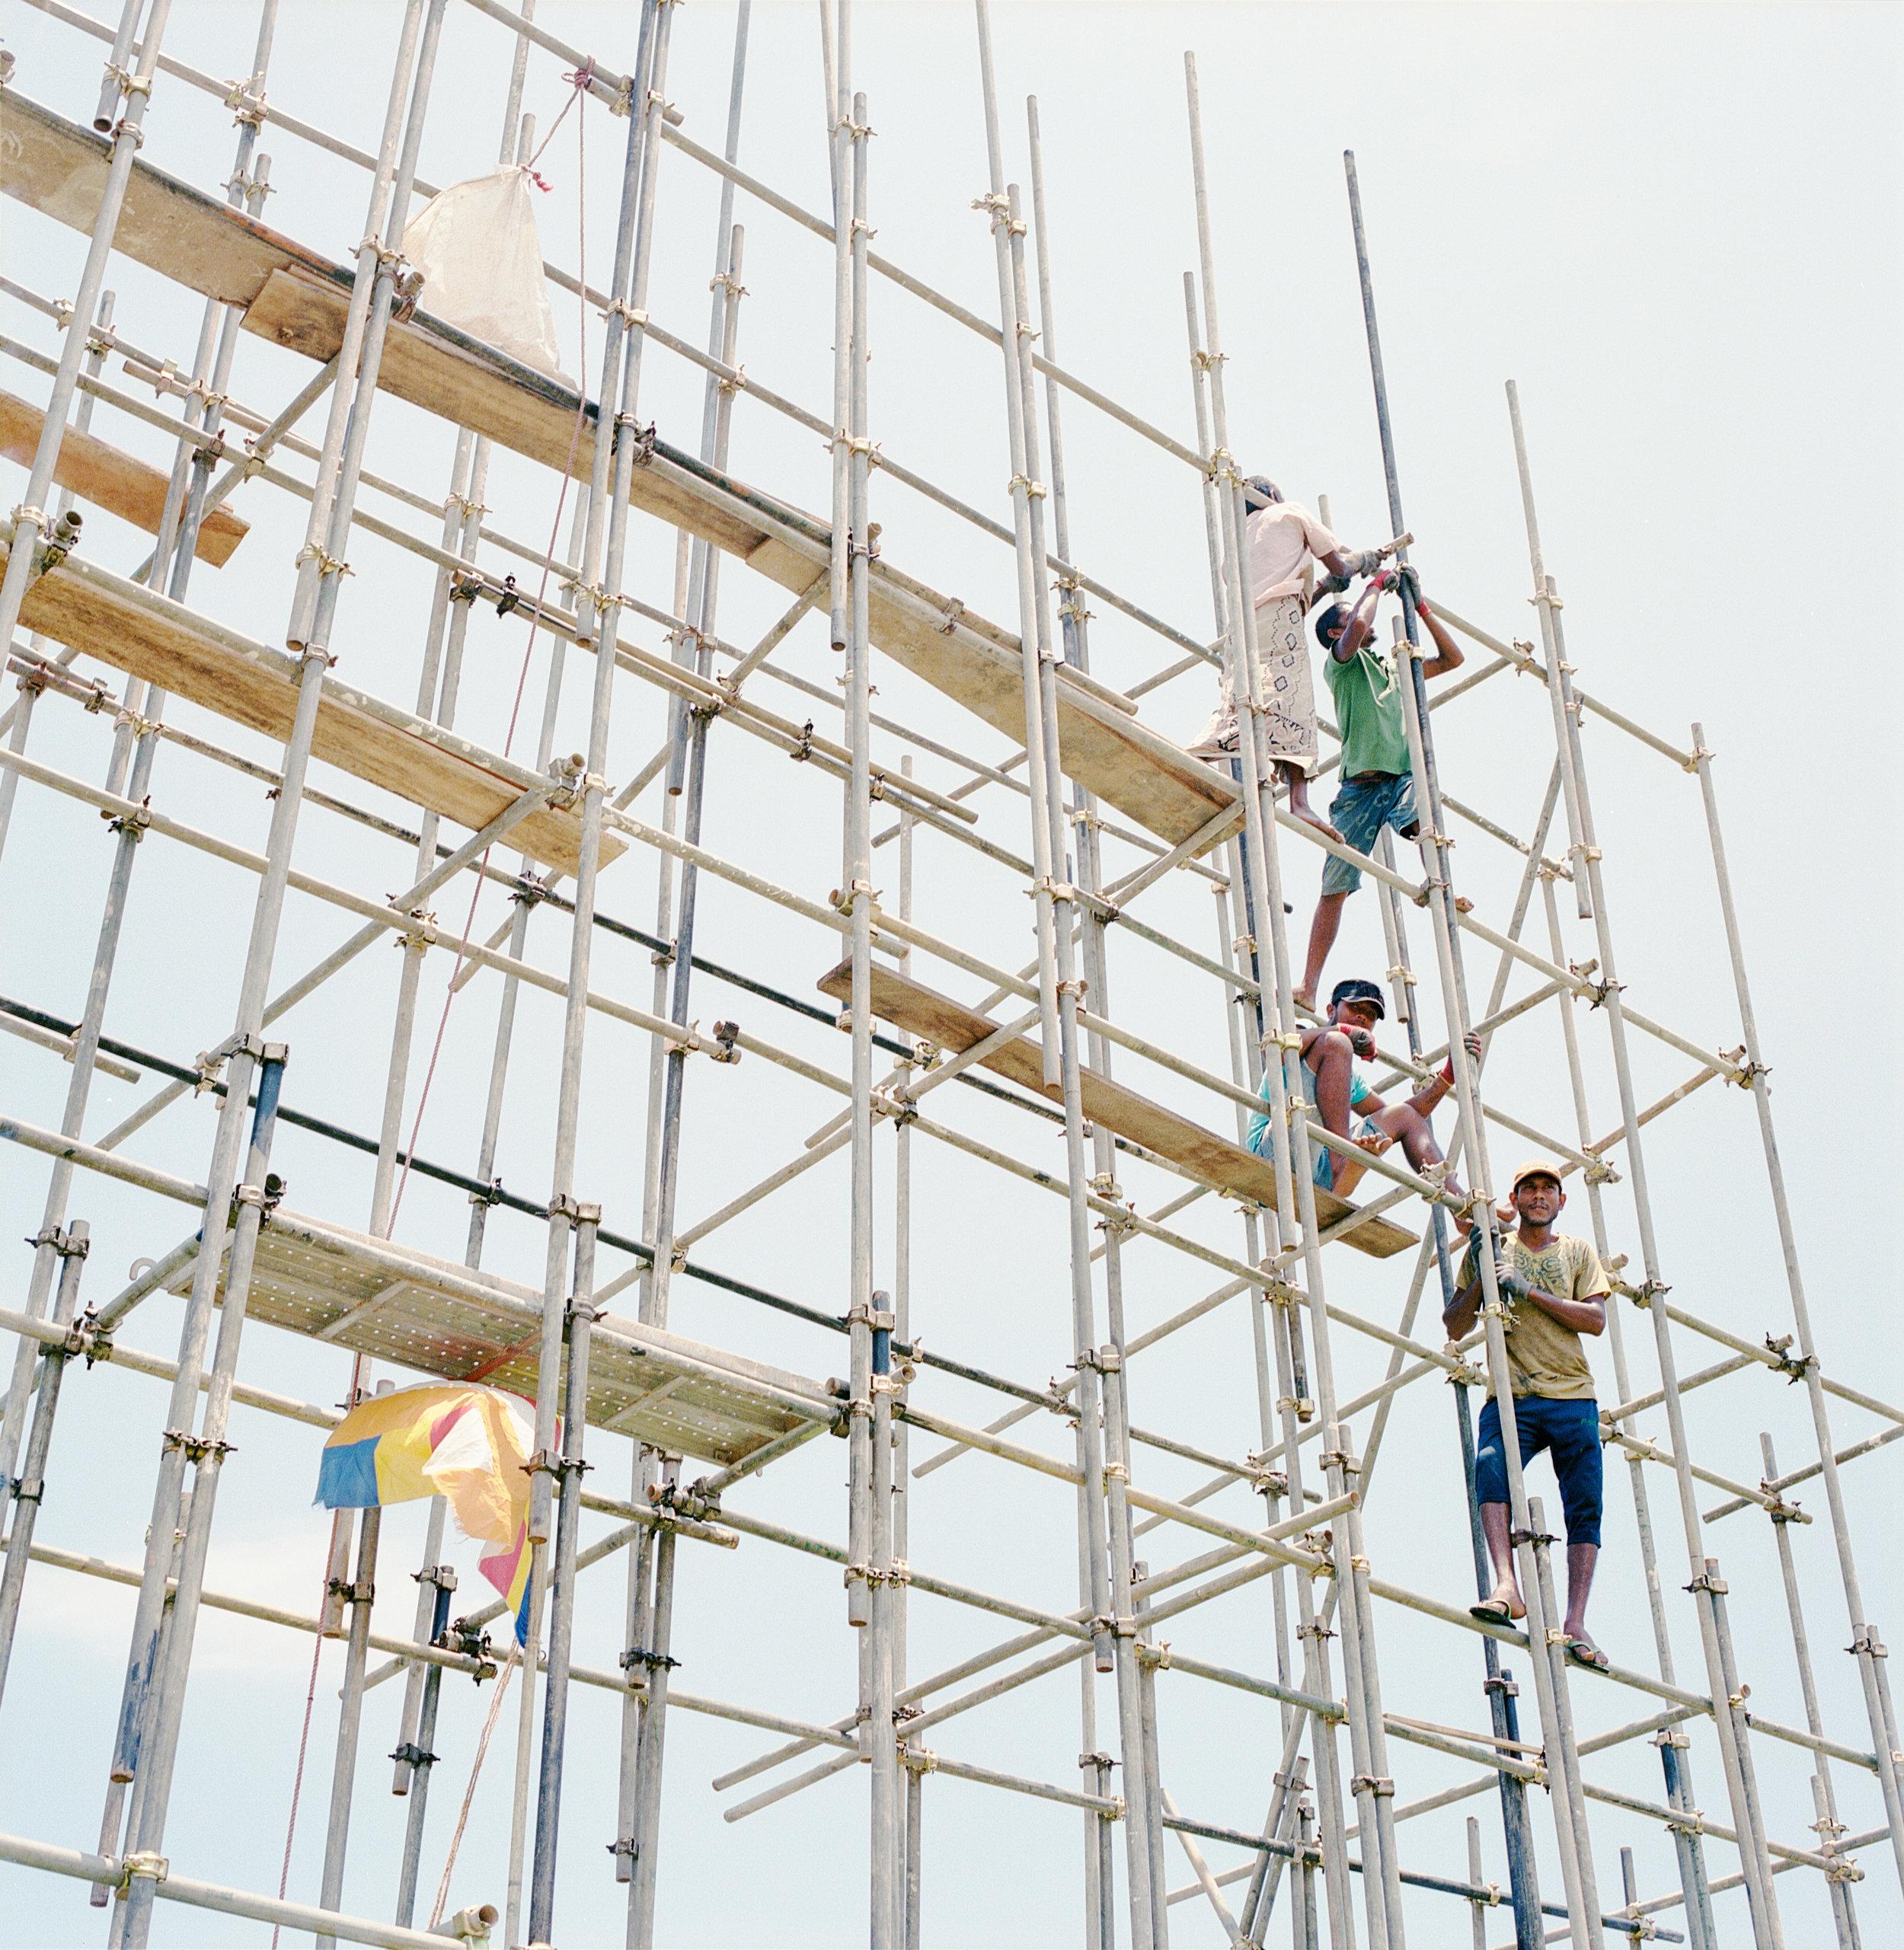 Hasselblad_SriLanka-11.jpg